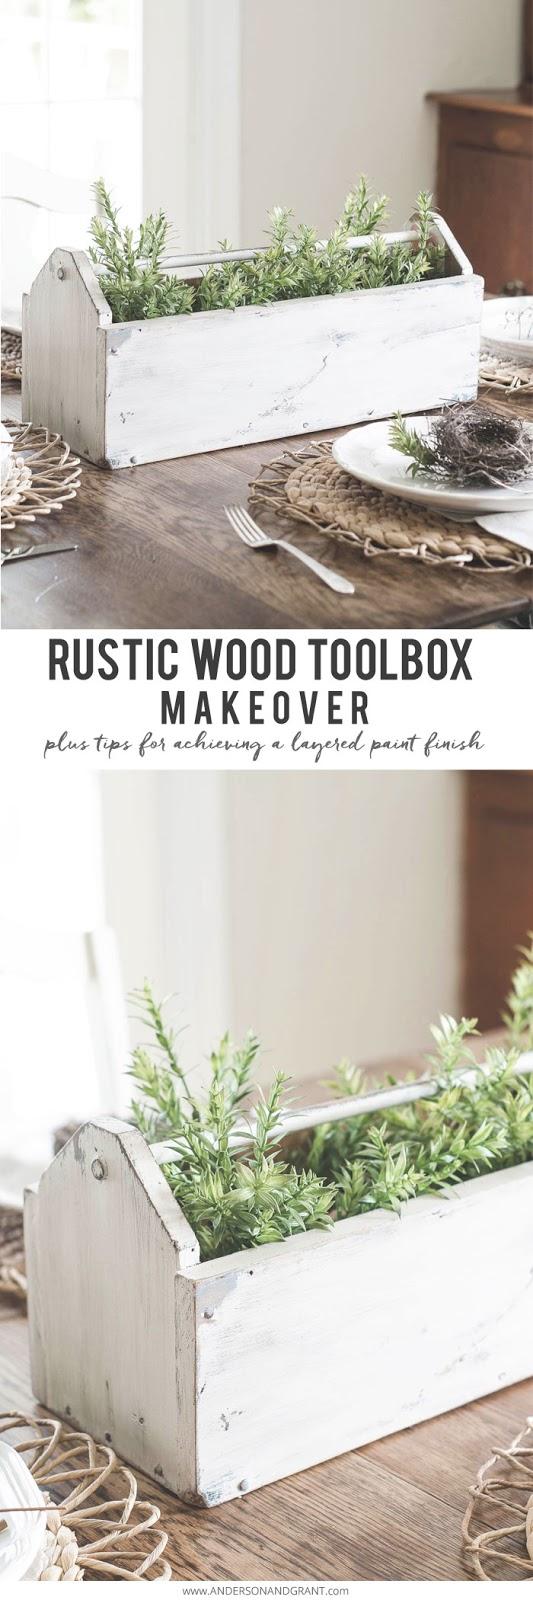 Make any wood tool box look old with this eay DIY paint idea.....instant farmhouse style #DIY #DIYdecor #tutorial #farmhousedecor #andersonandgrant